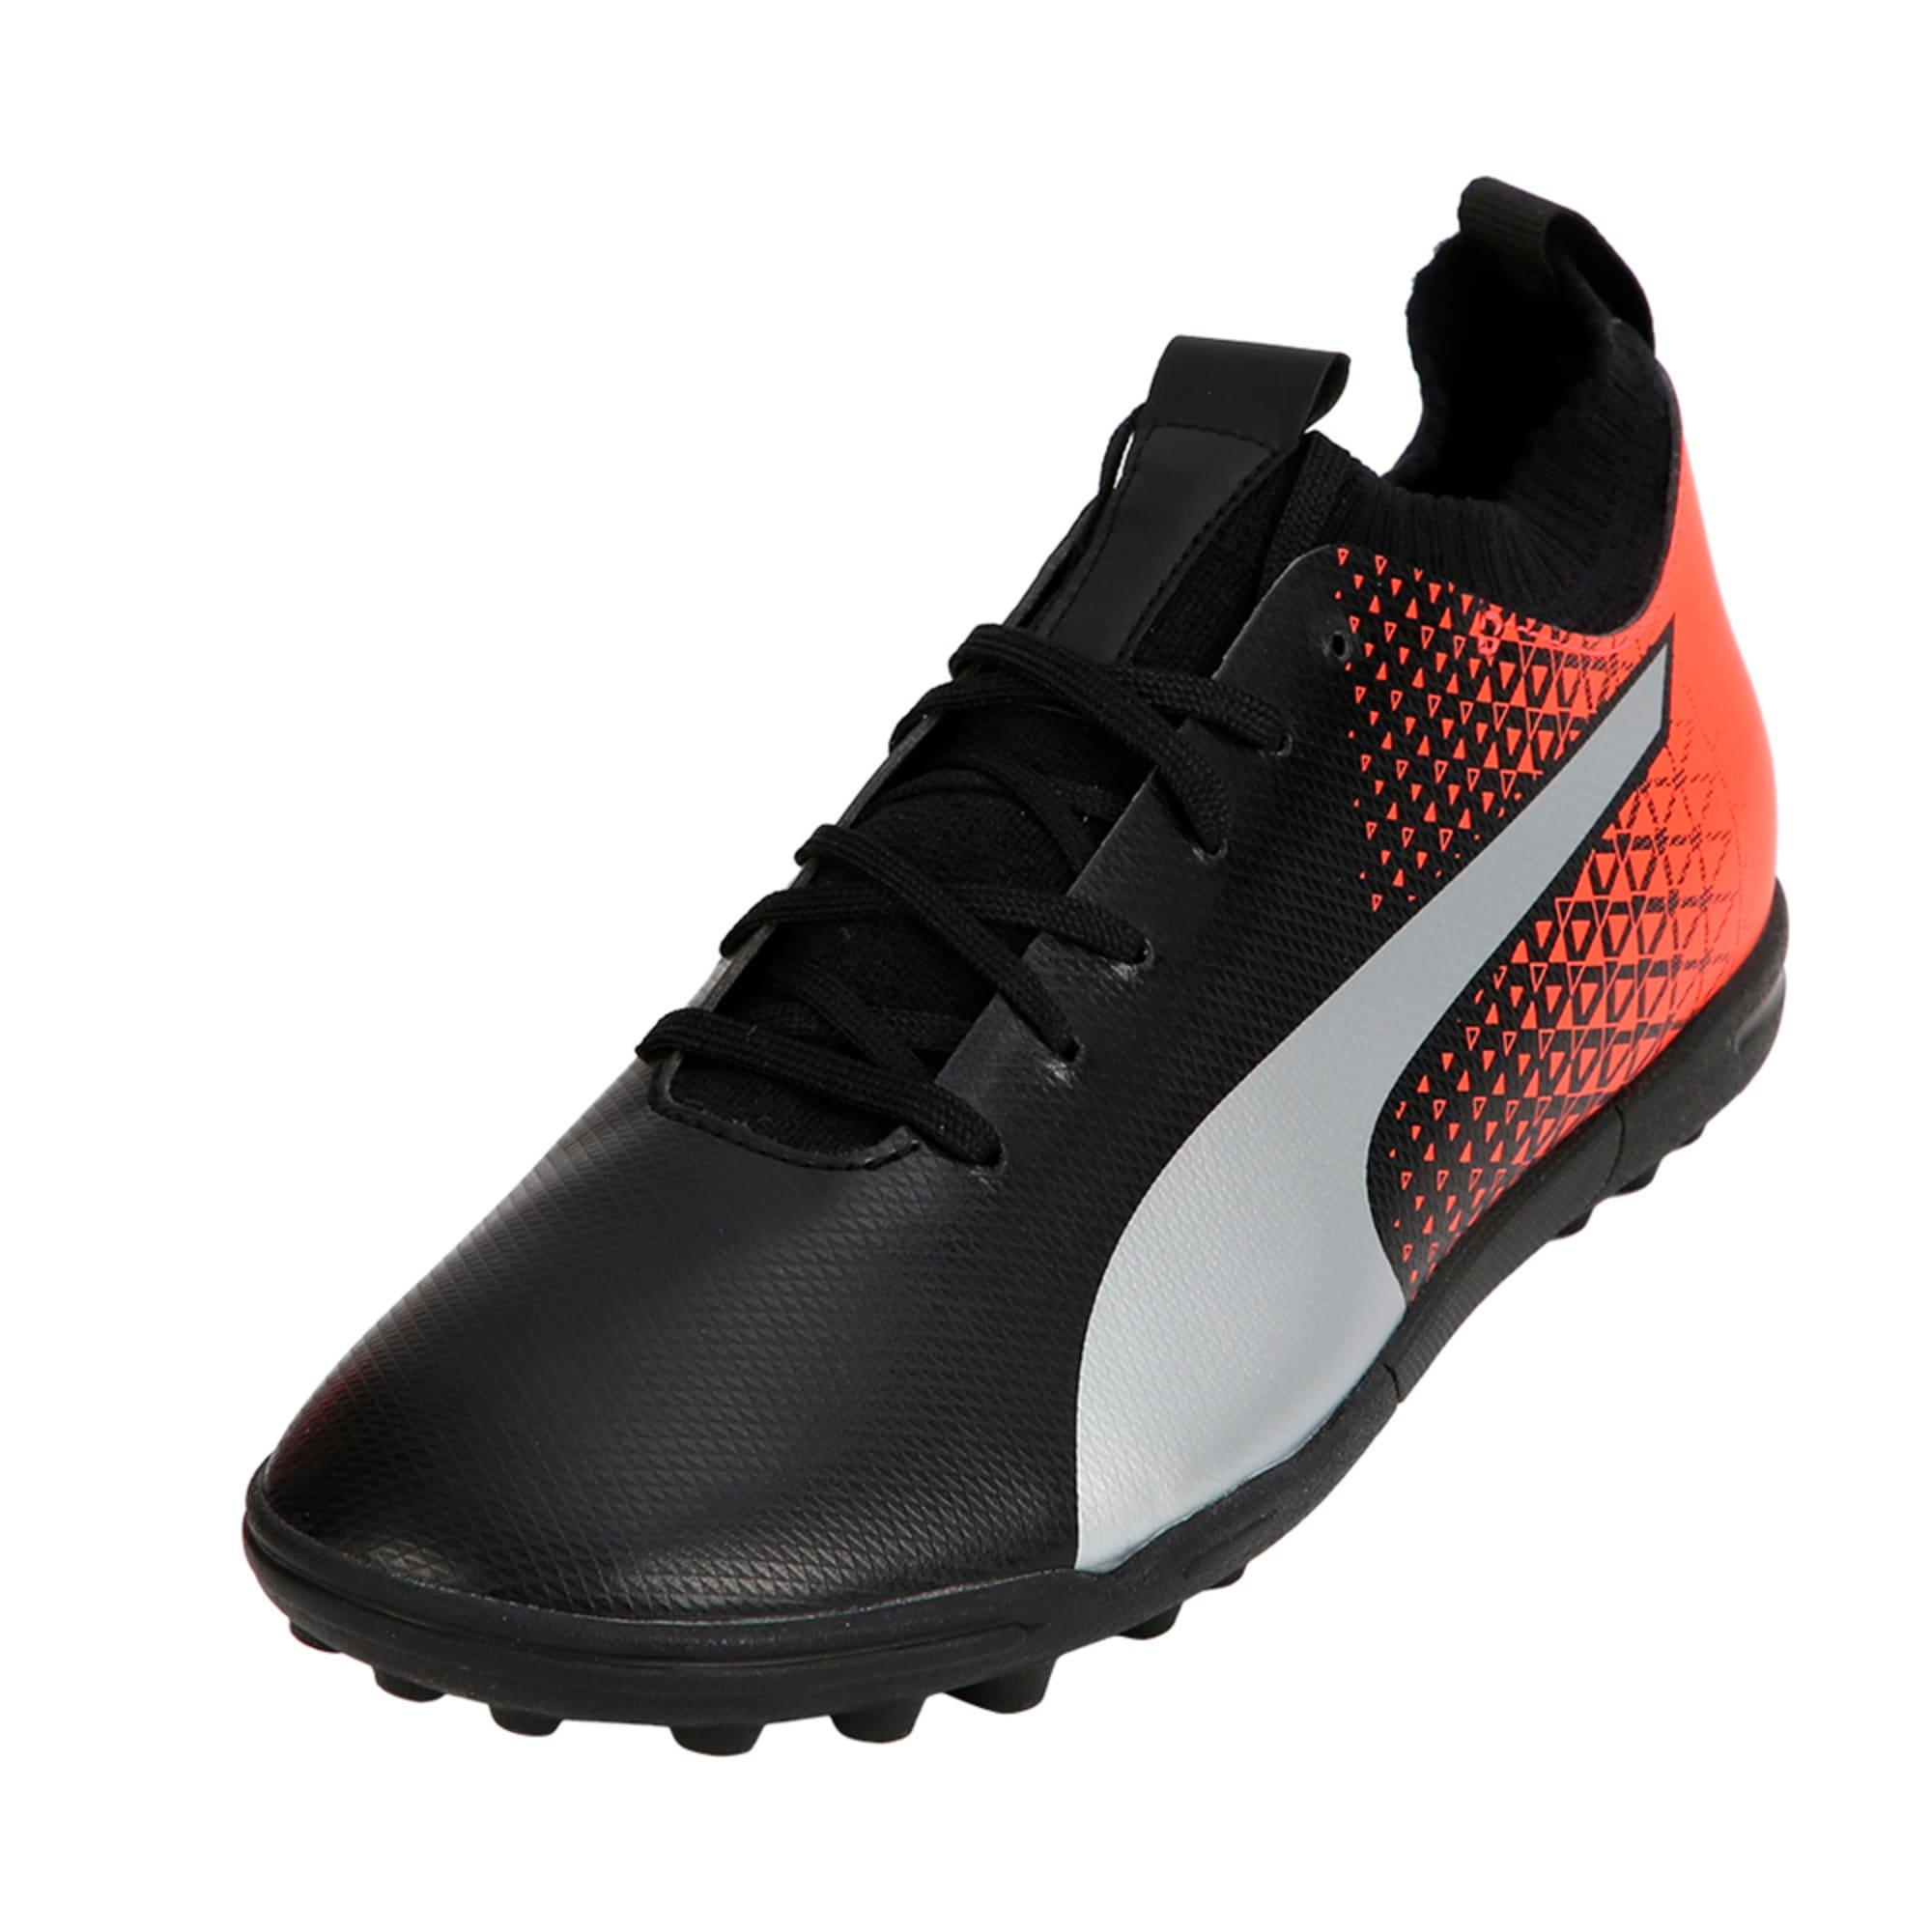 Thumbnail 1 of evoKNIT TT Men's Football Shoes, Black-Silver-Red, medium-IND